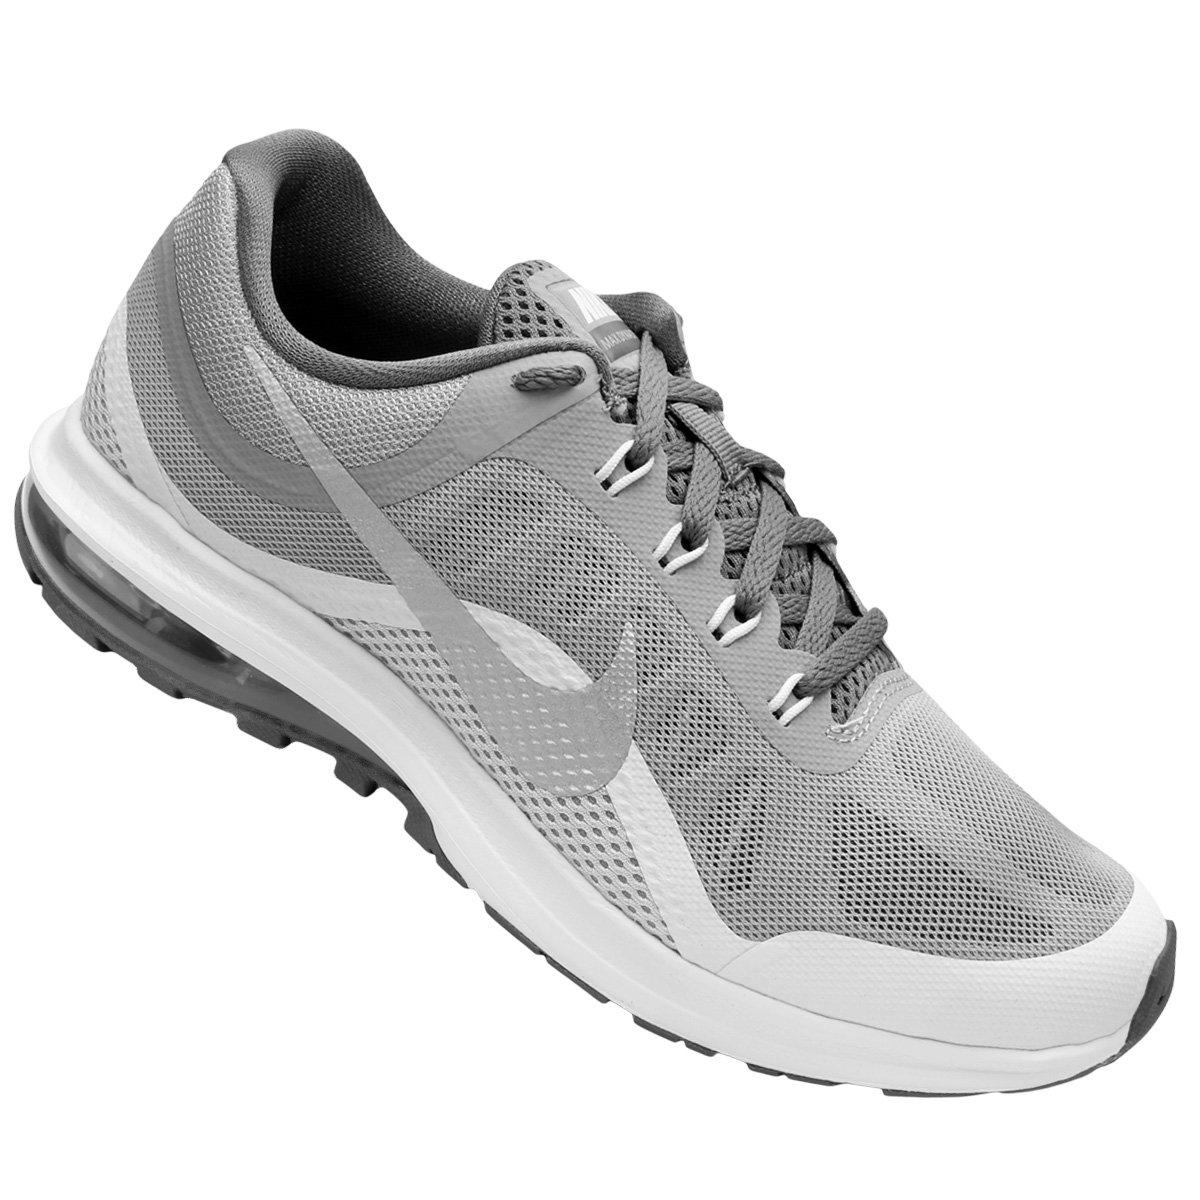 980259399dd Tênis Nike Air Max Dynasty 2 Feminino - Cinza e Branco - Compre Agora